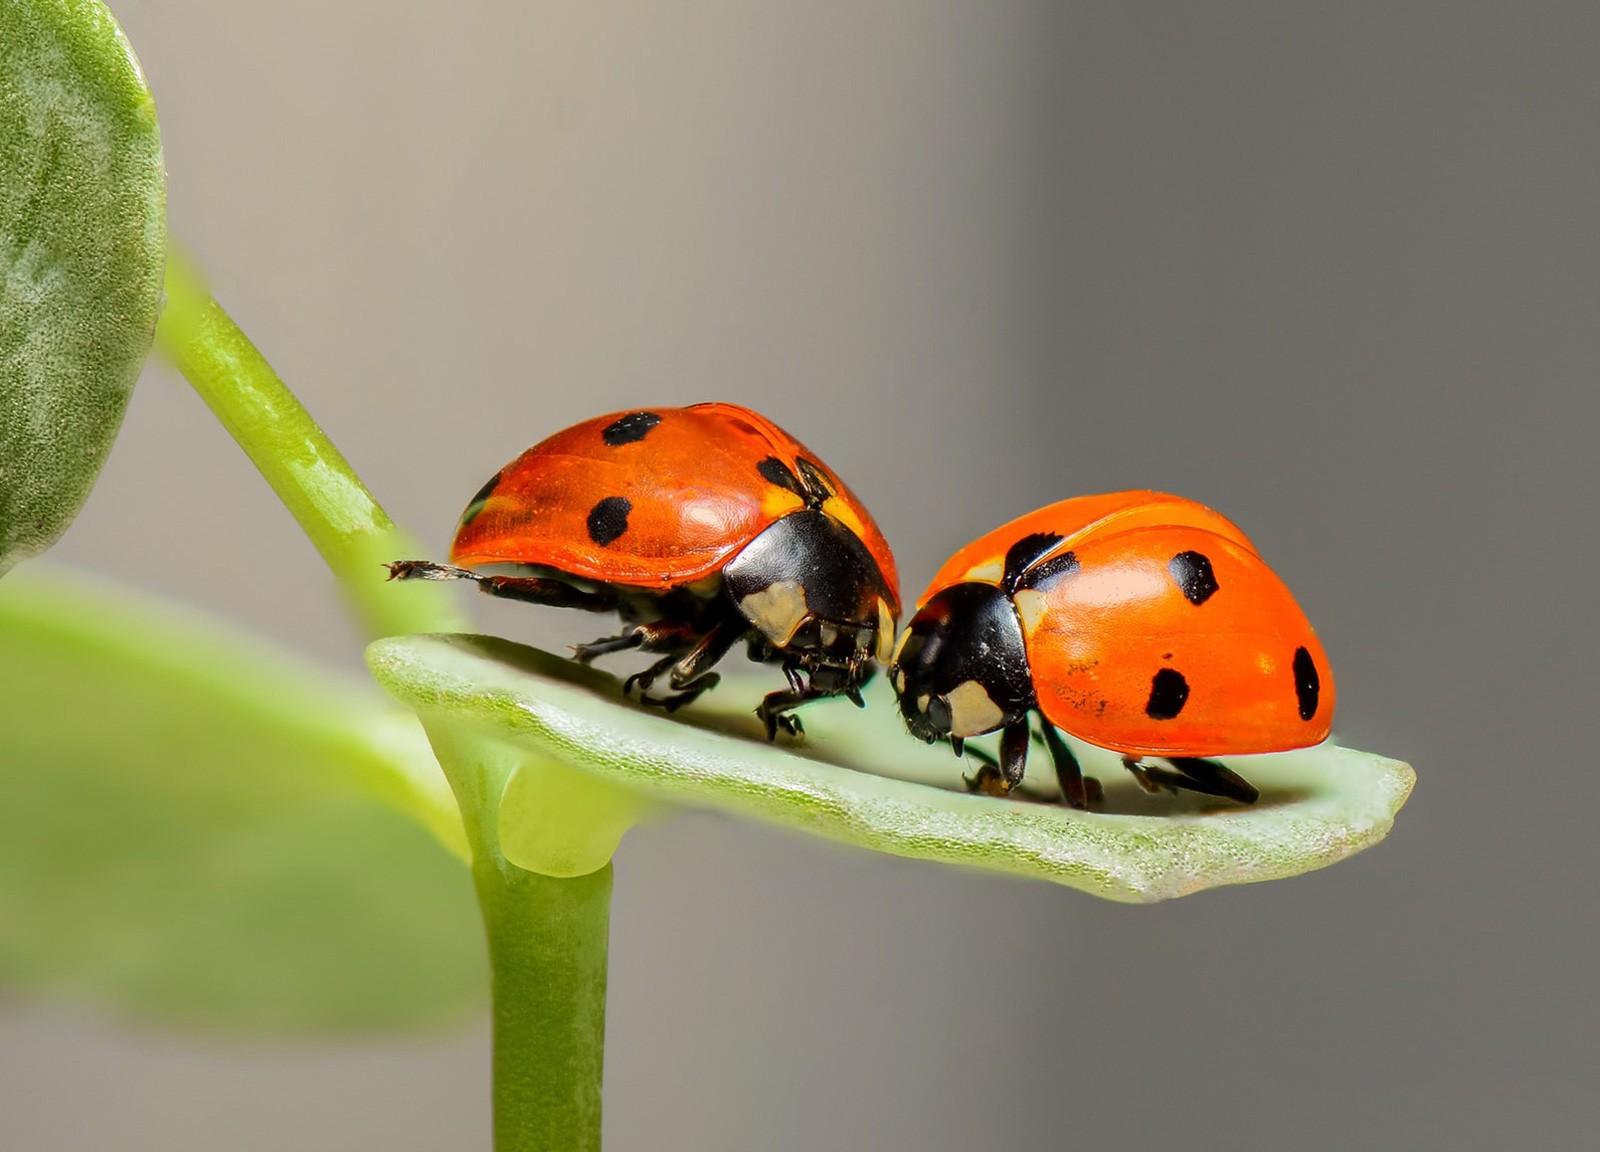 Ladybug significance